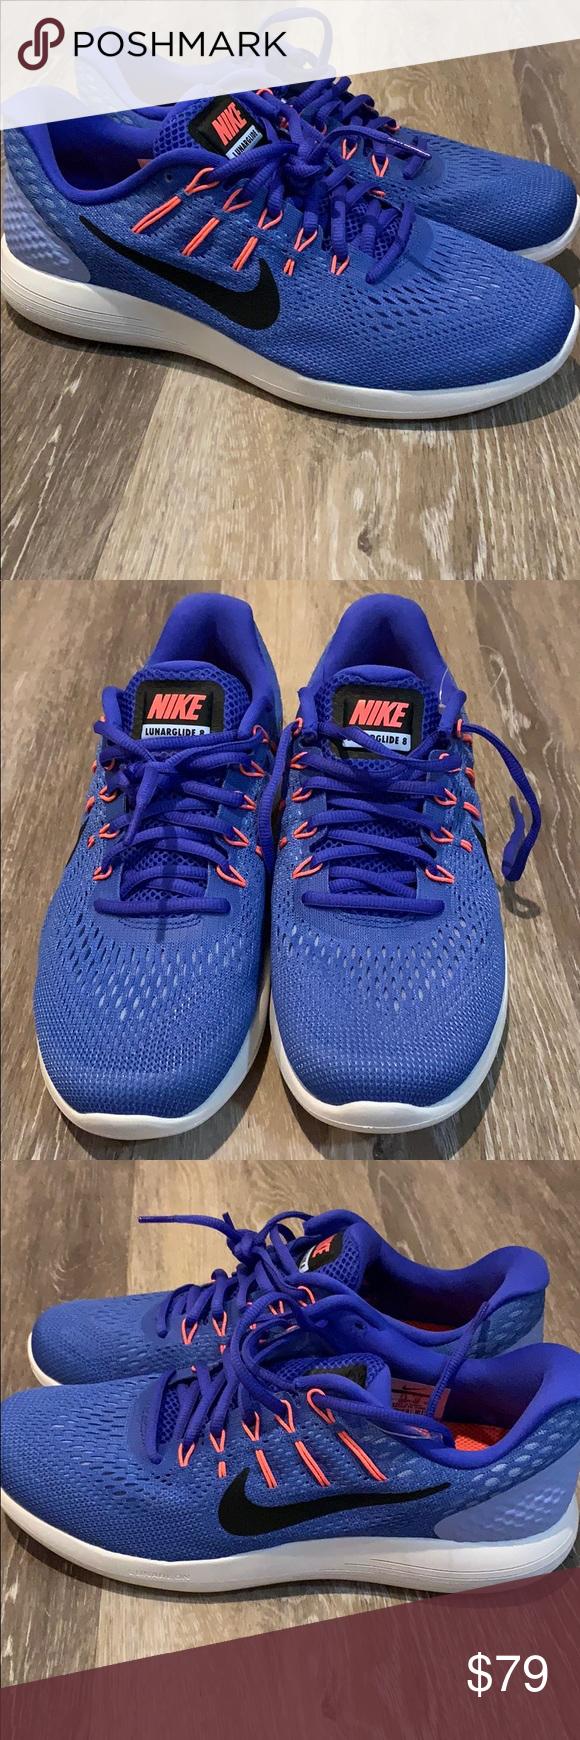 9d0d56ce4c52 NIke Lunarglide 8 Women s Running Shoe Sz 10 Blue NIke Lunarglide 8 Women s  Running Shoe Sz 10 Blue Black White AA8677-406 Never worn just missing  original ...